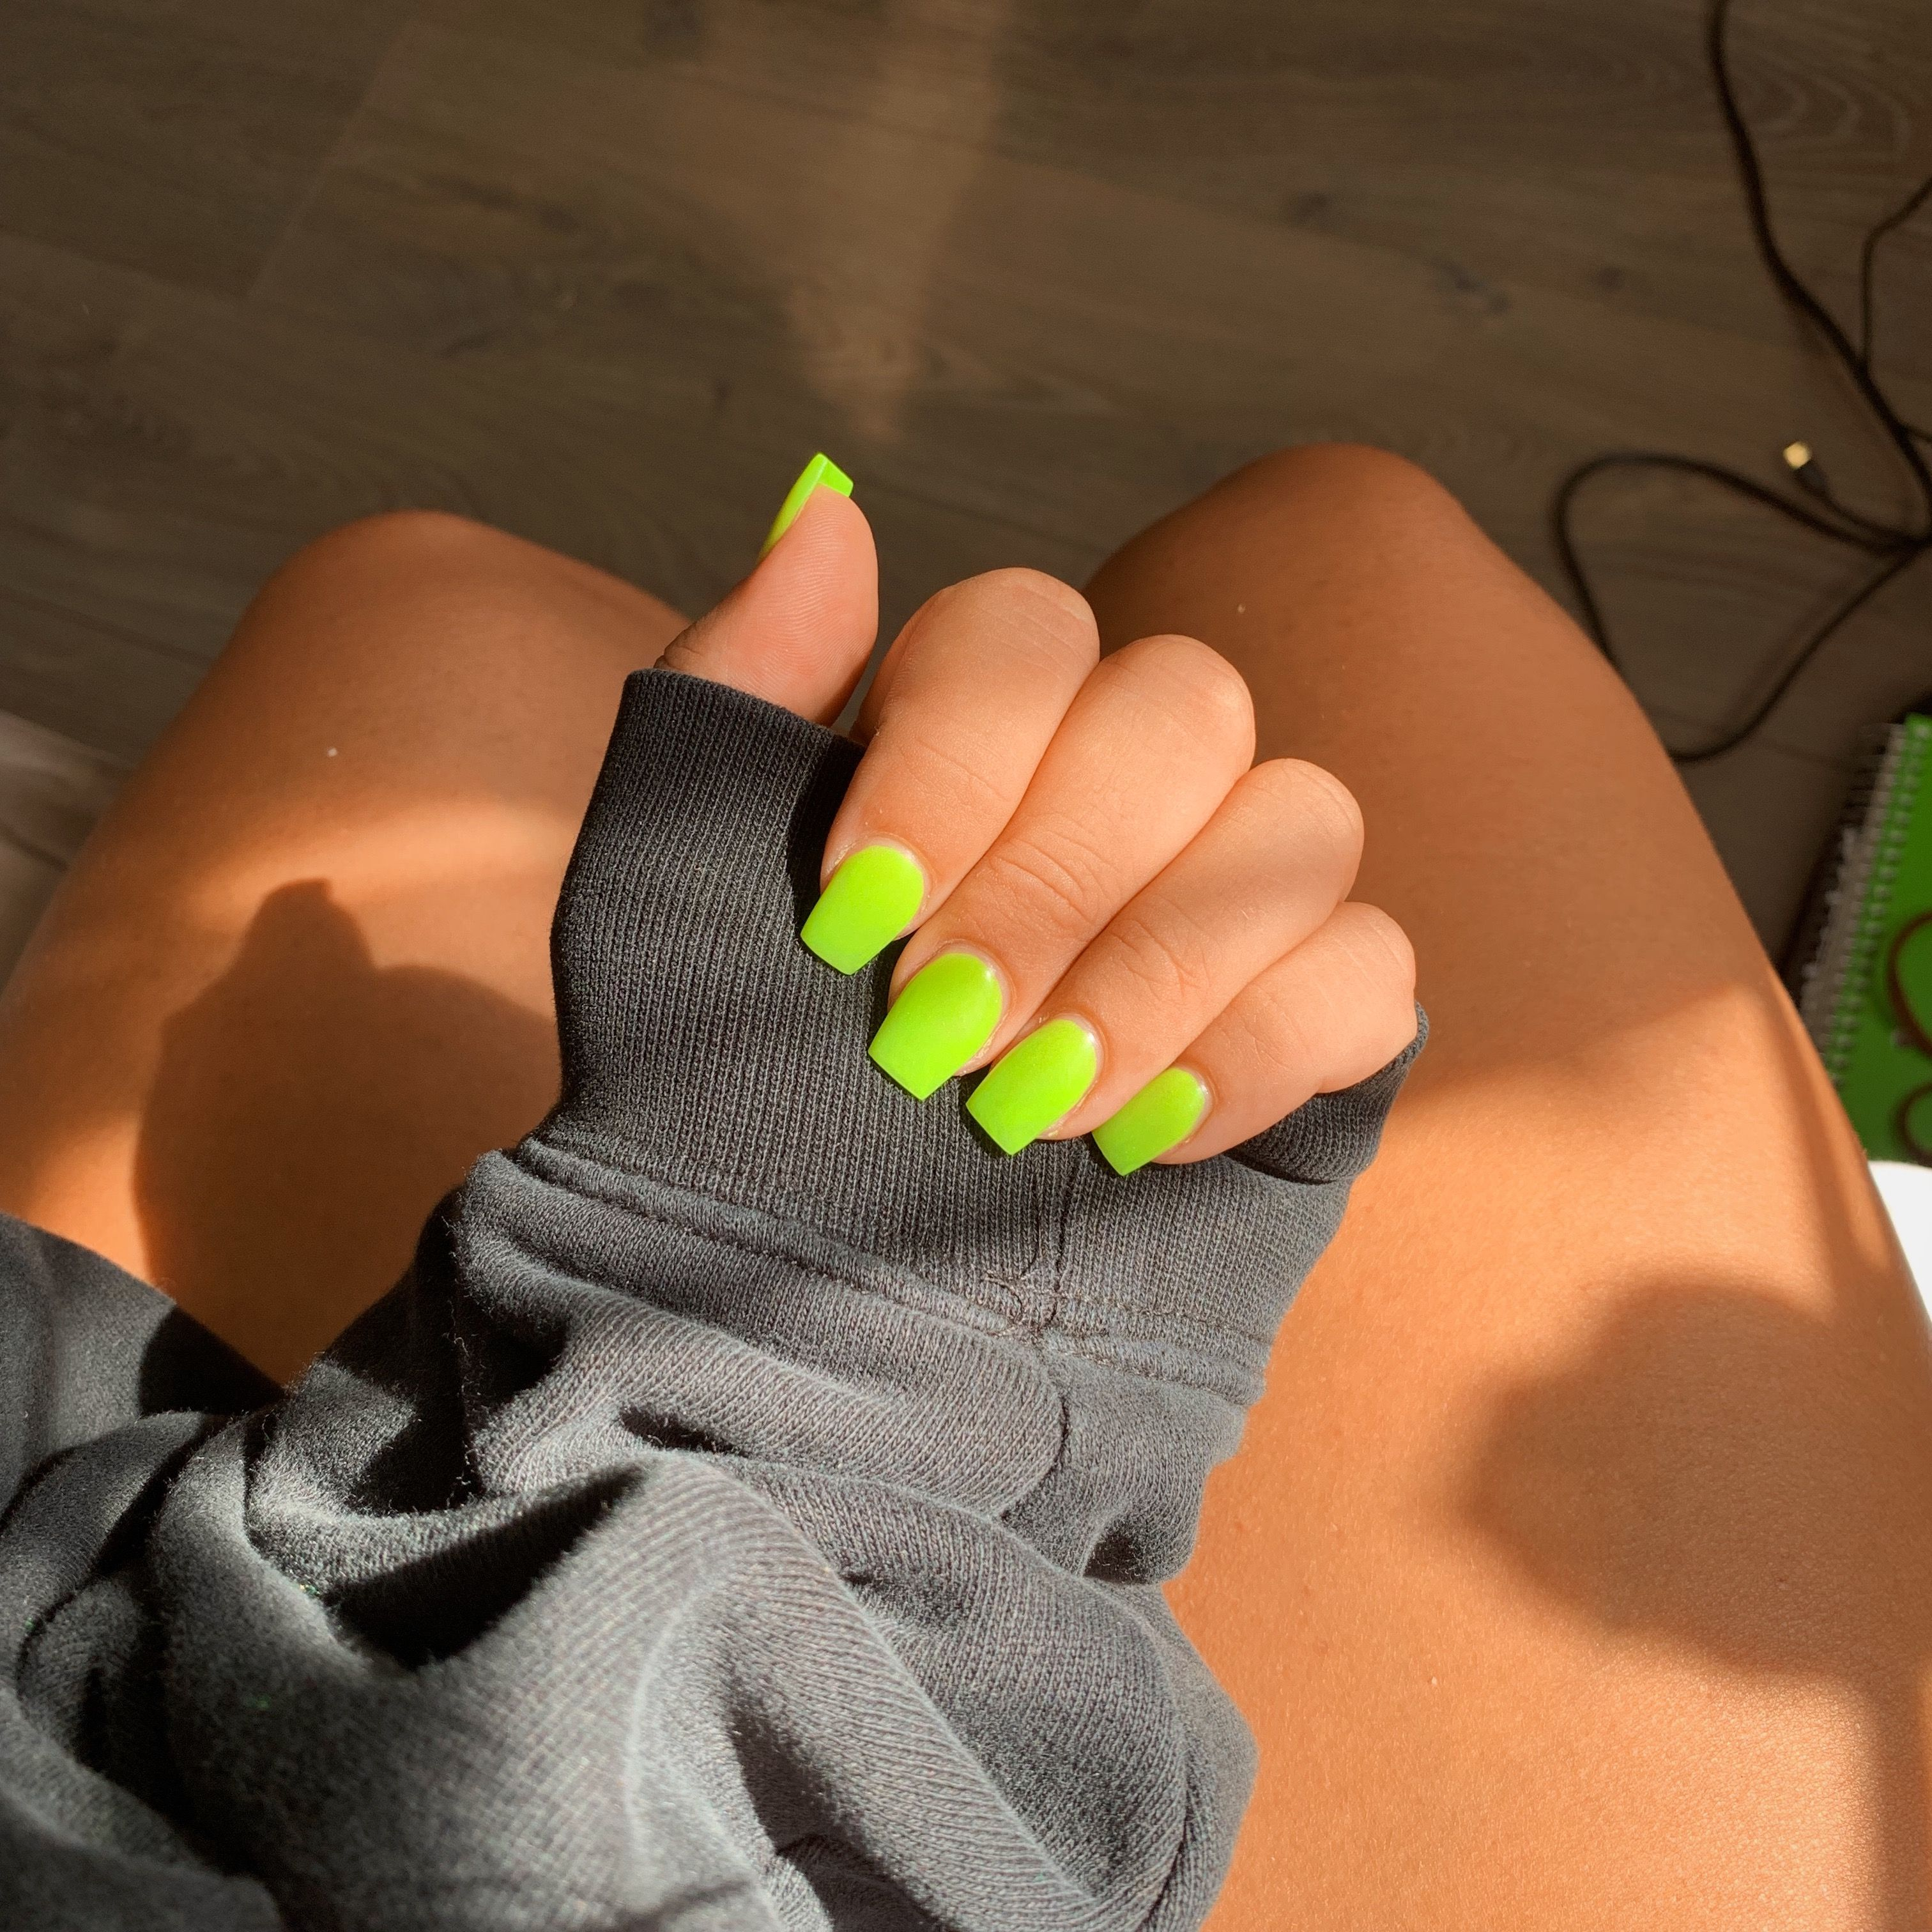 Neon Green Acrylic Coffin Nails Acrylic Nails Yellow Bright Acrylic Nails Coffin Shape Nails